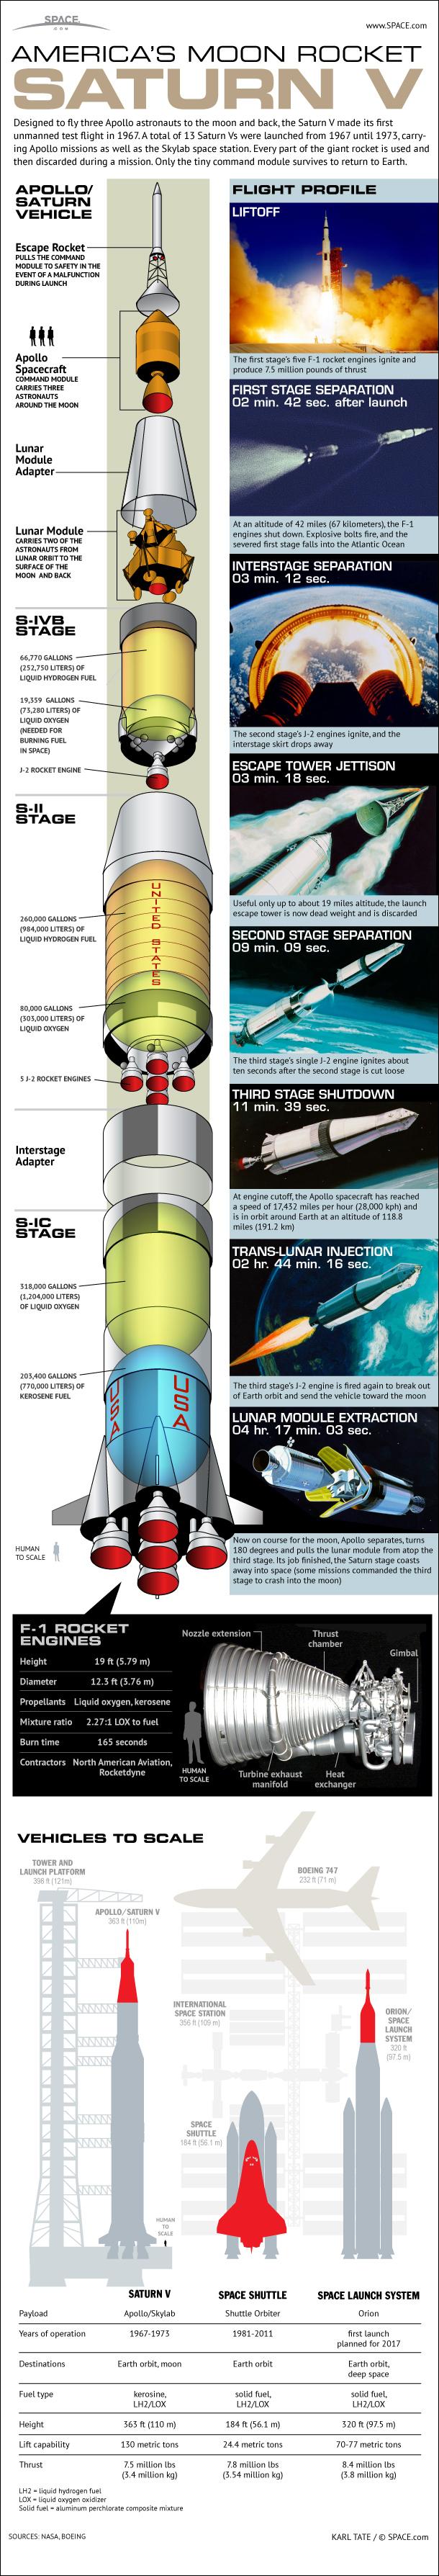 America's Moon Rocket: The Saturn V